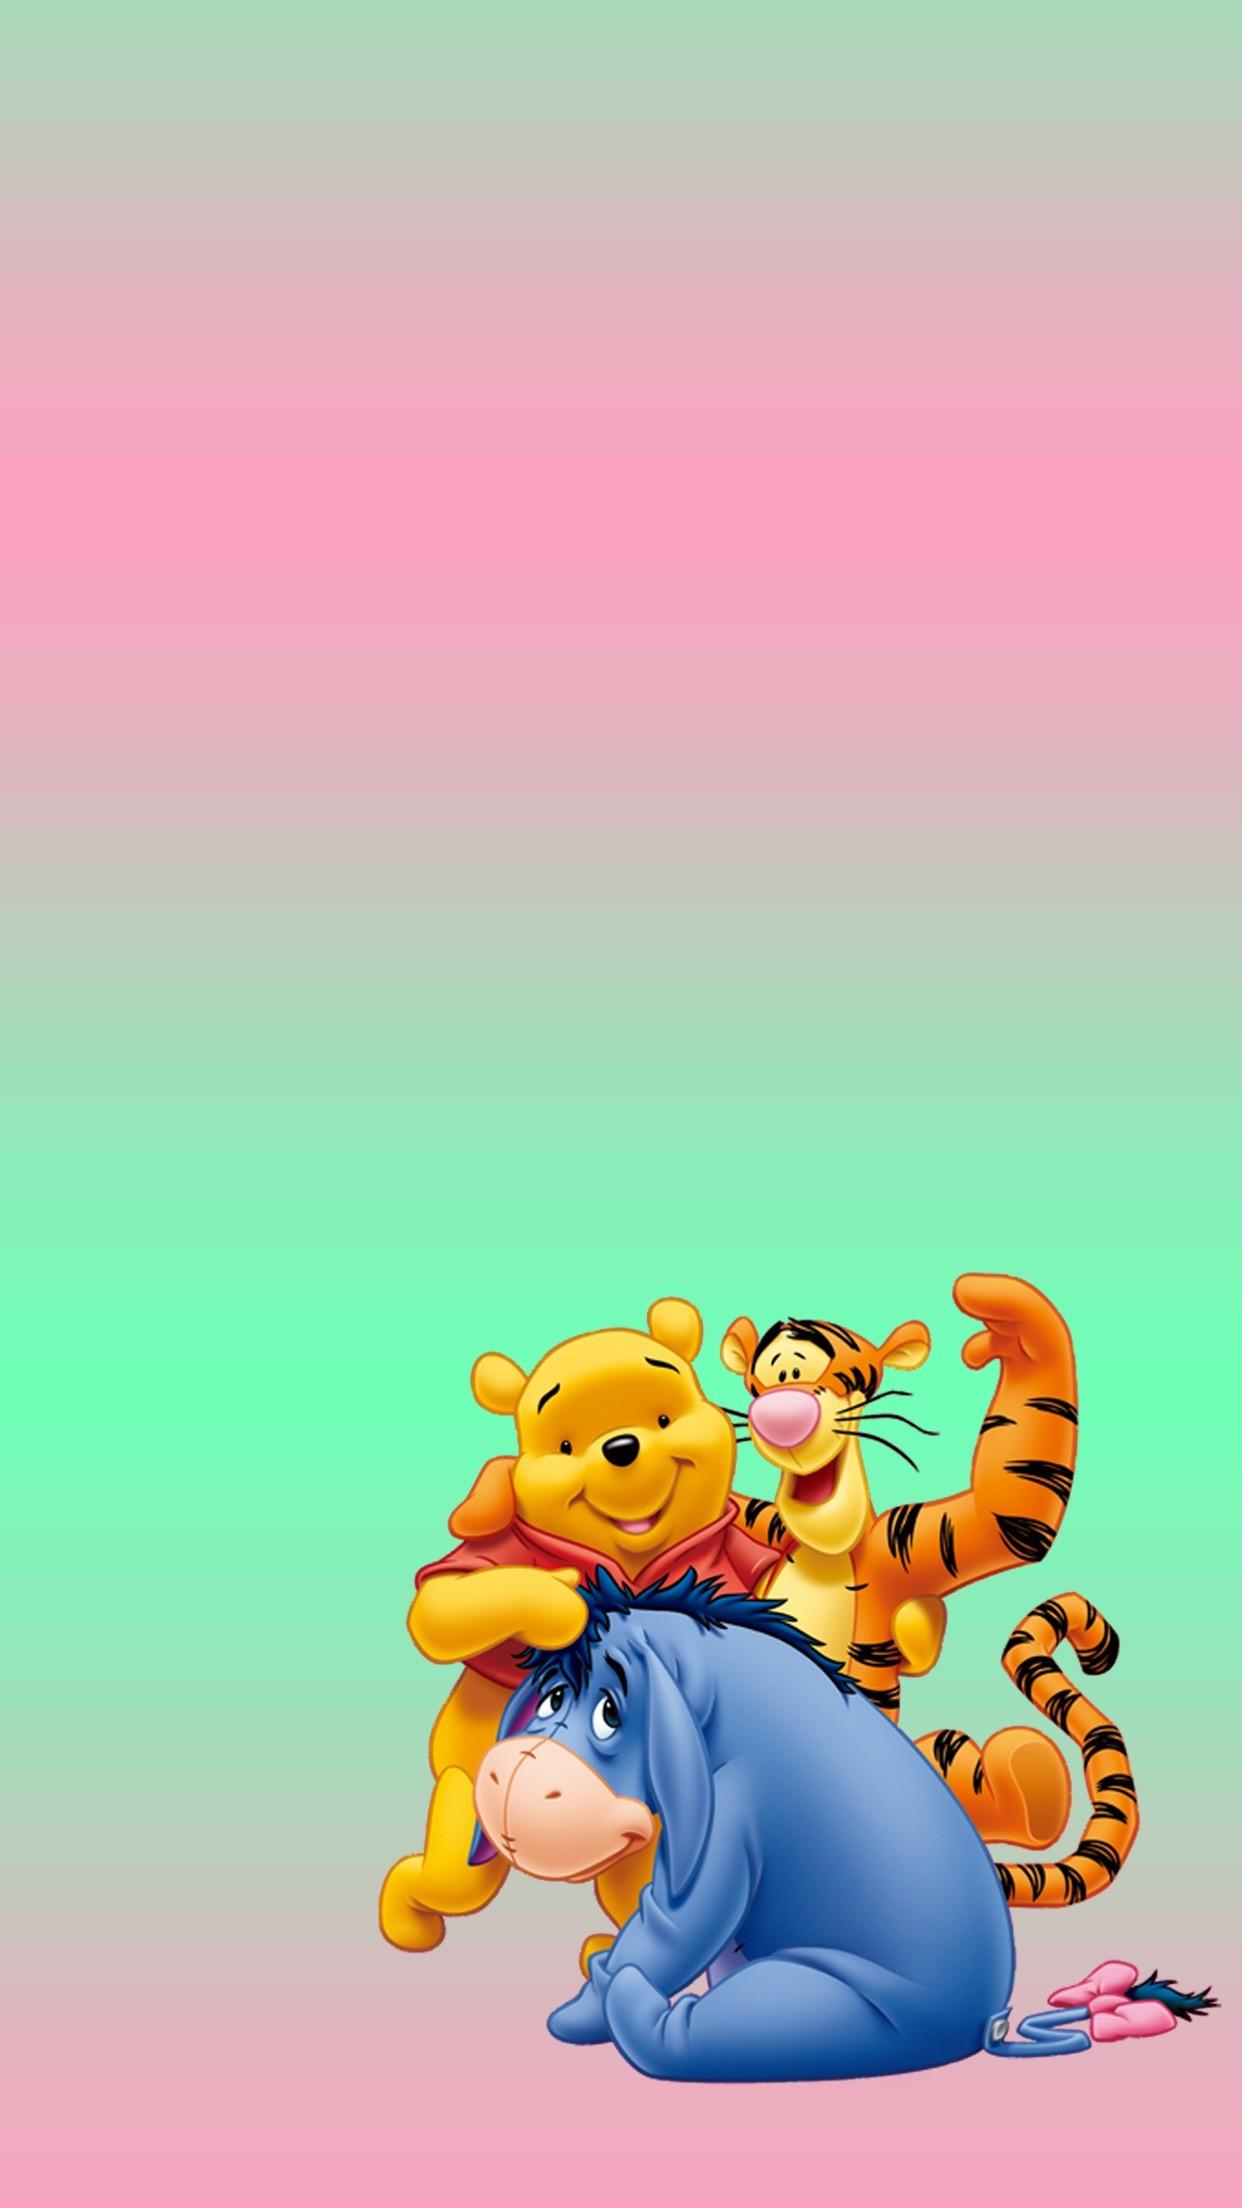 Winnie The Pooh Fall Desktop Wallpaper Wallpaper Pooh Bear 56 Images